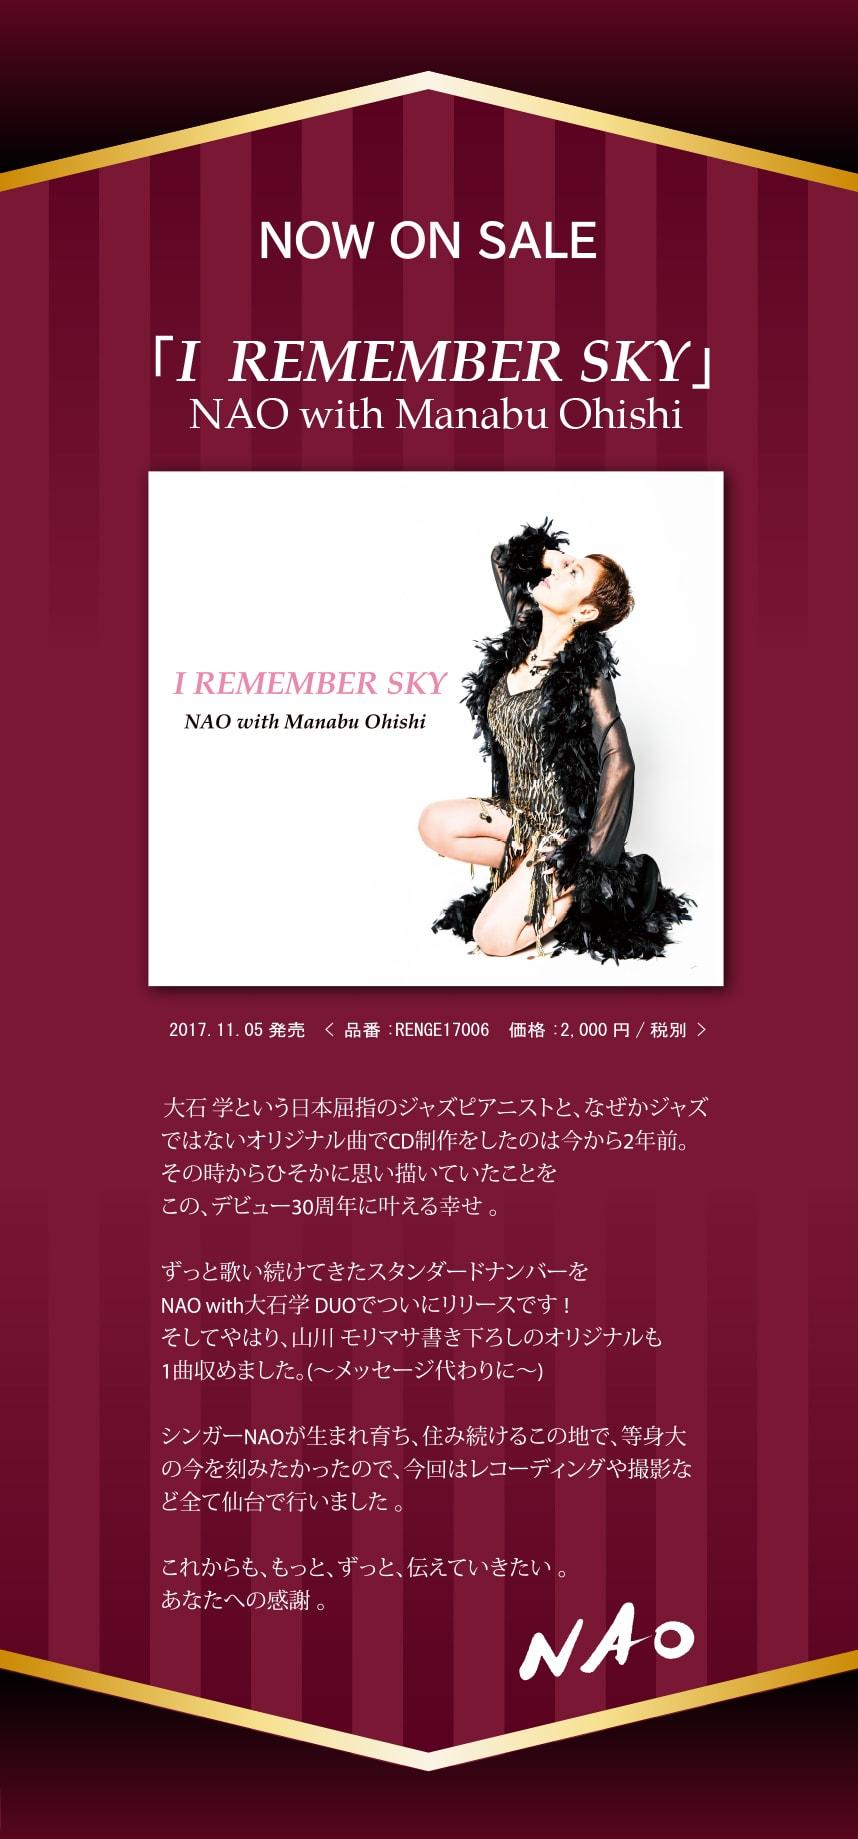 NOW ON SALE「I REMEMBER SKY」2017.11.15 発売